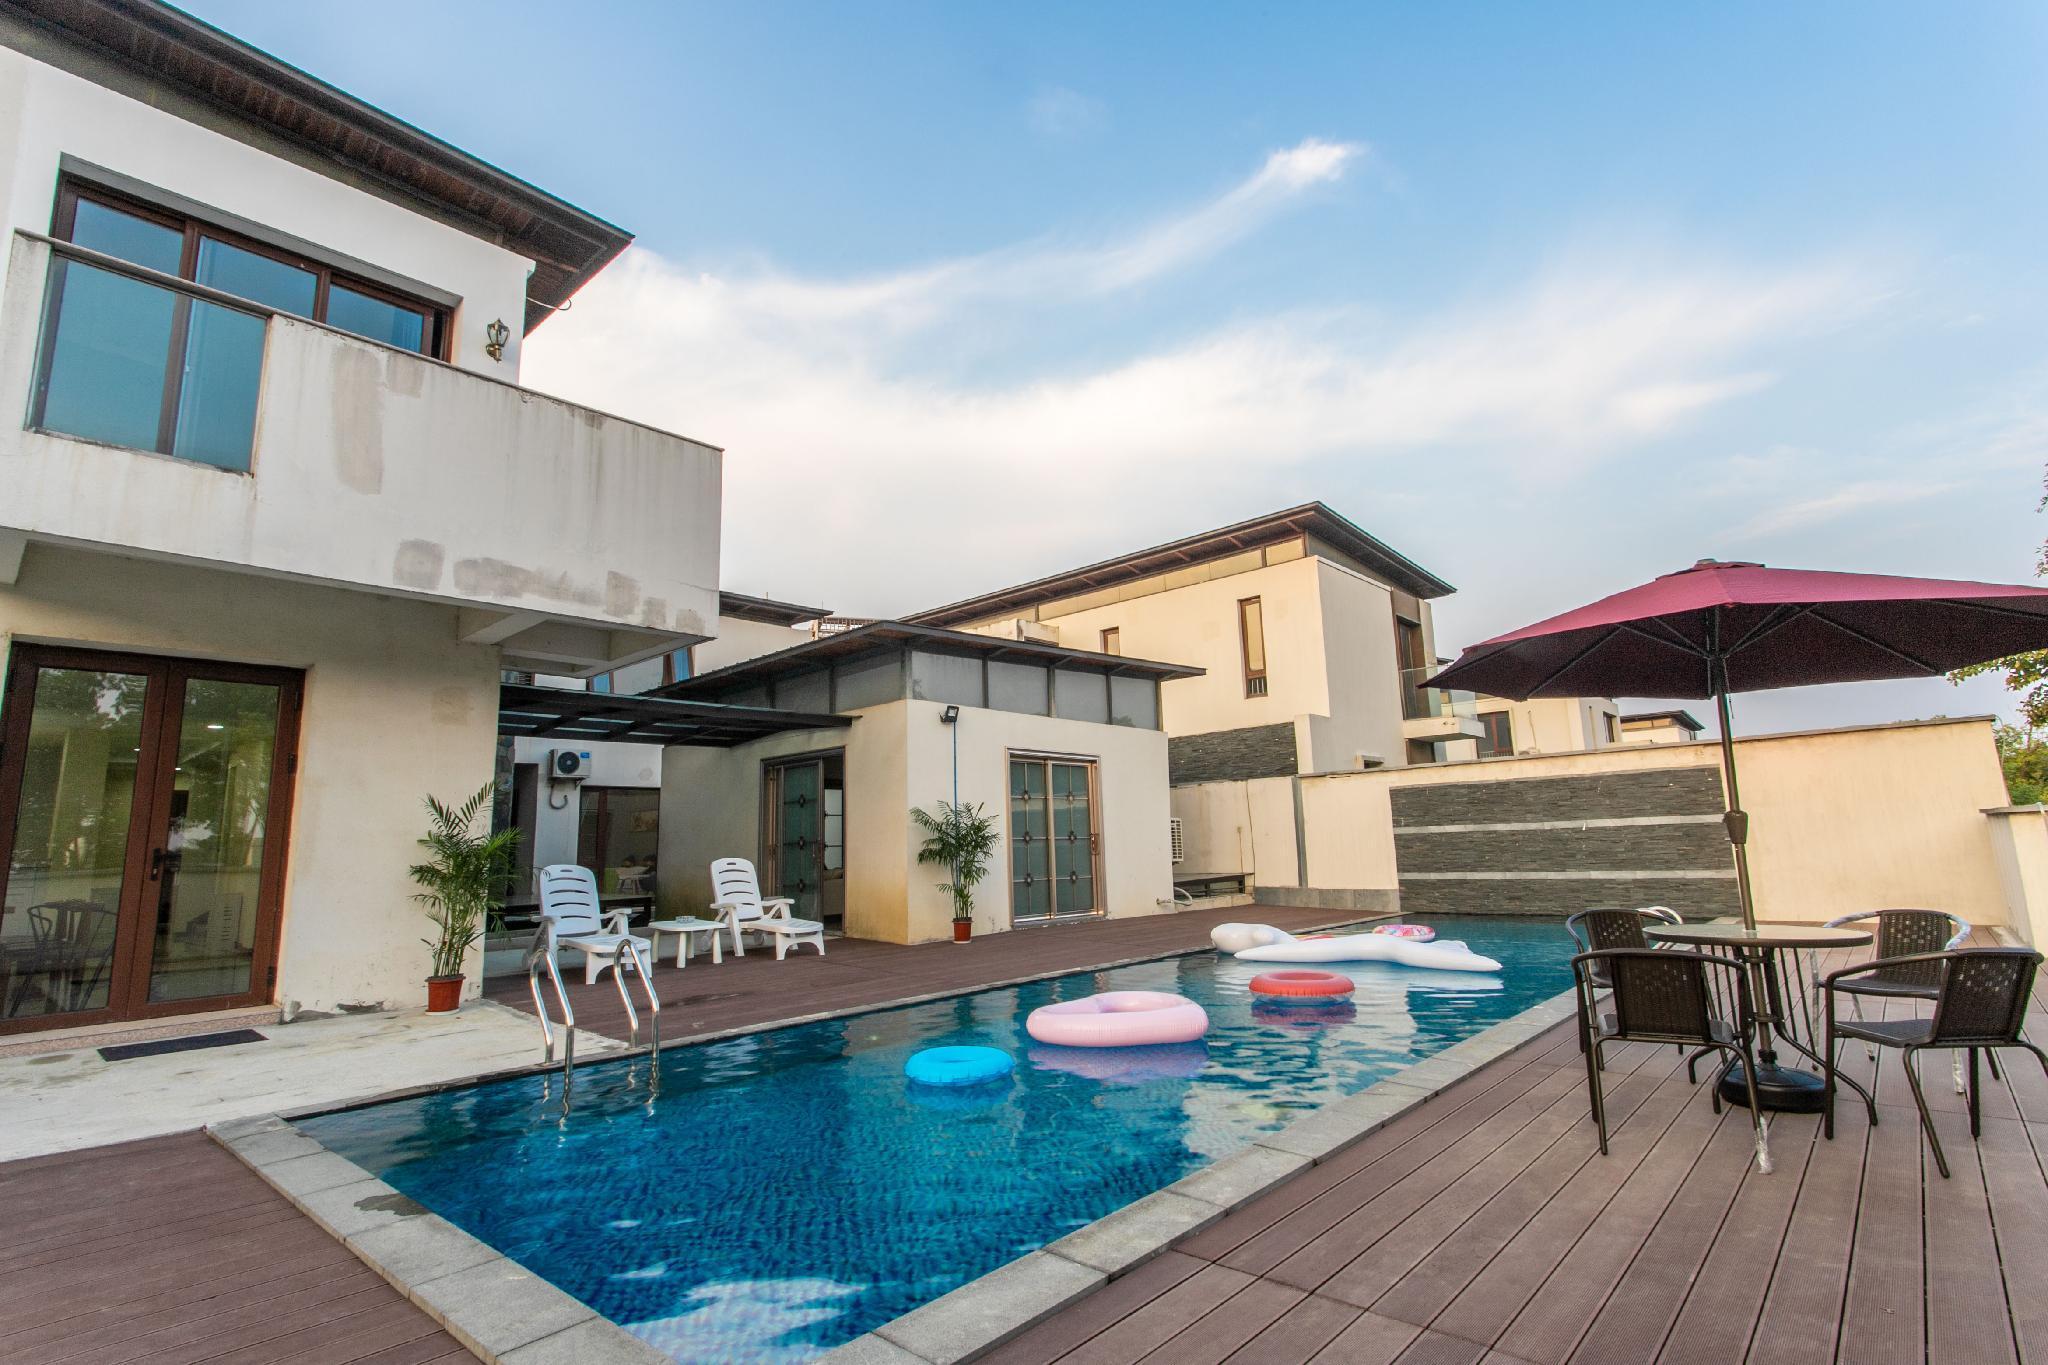 Suzhou Geocentric Theme Villa Home Party